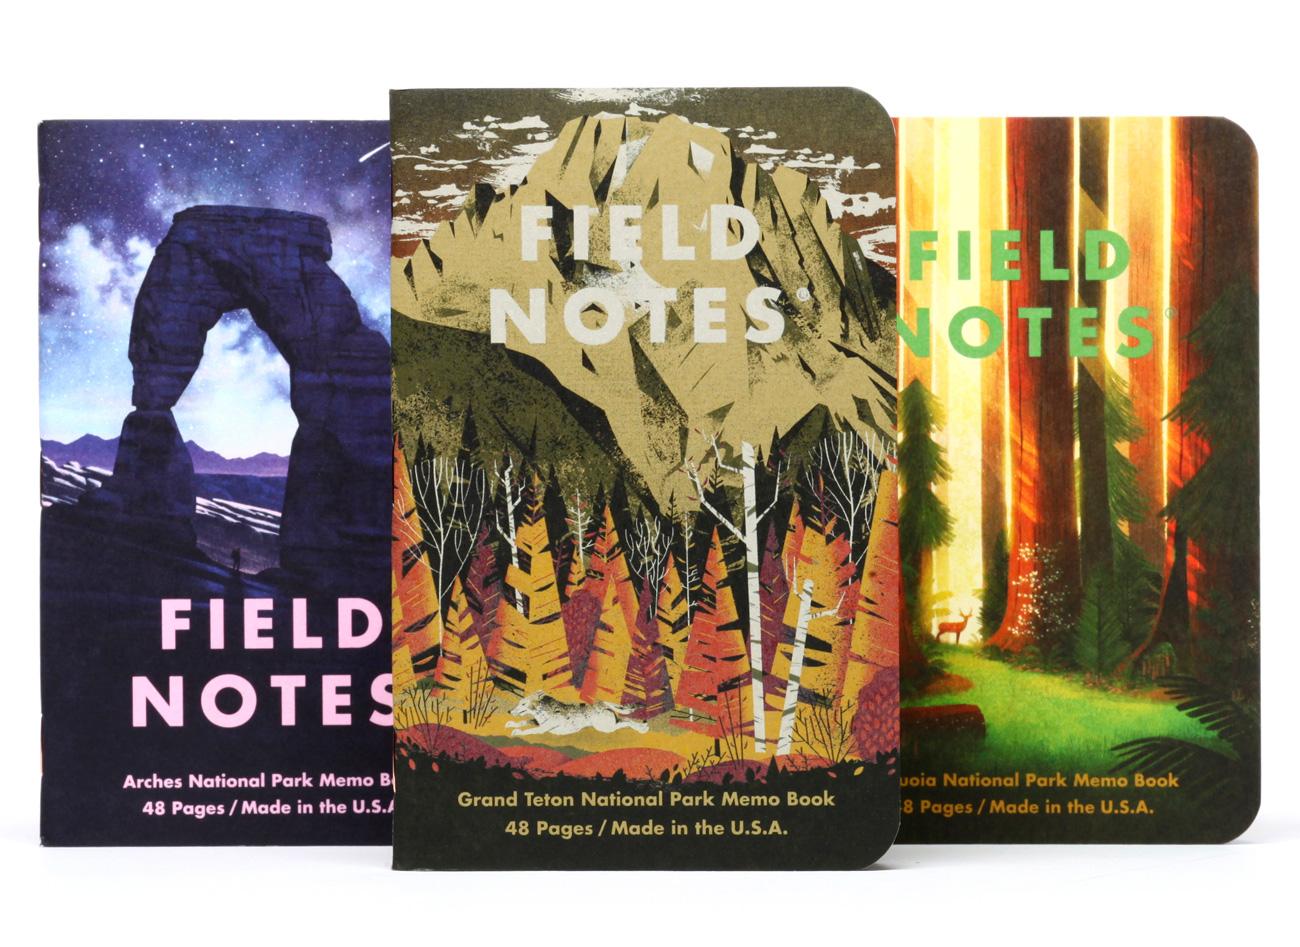 Field Notes National Park Edition, SerieD, Notizhefte 3er-Pack